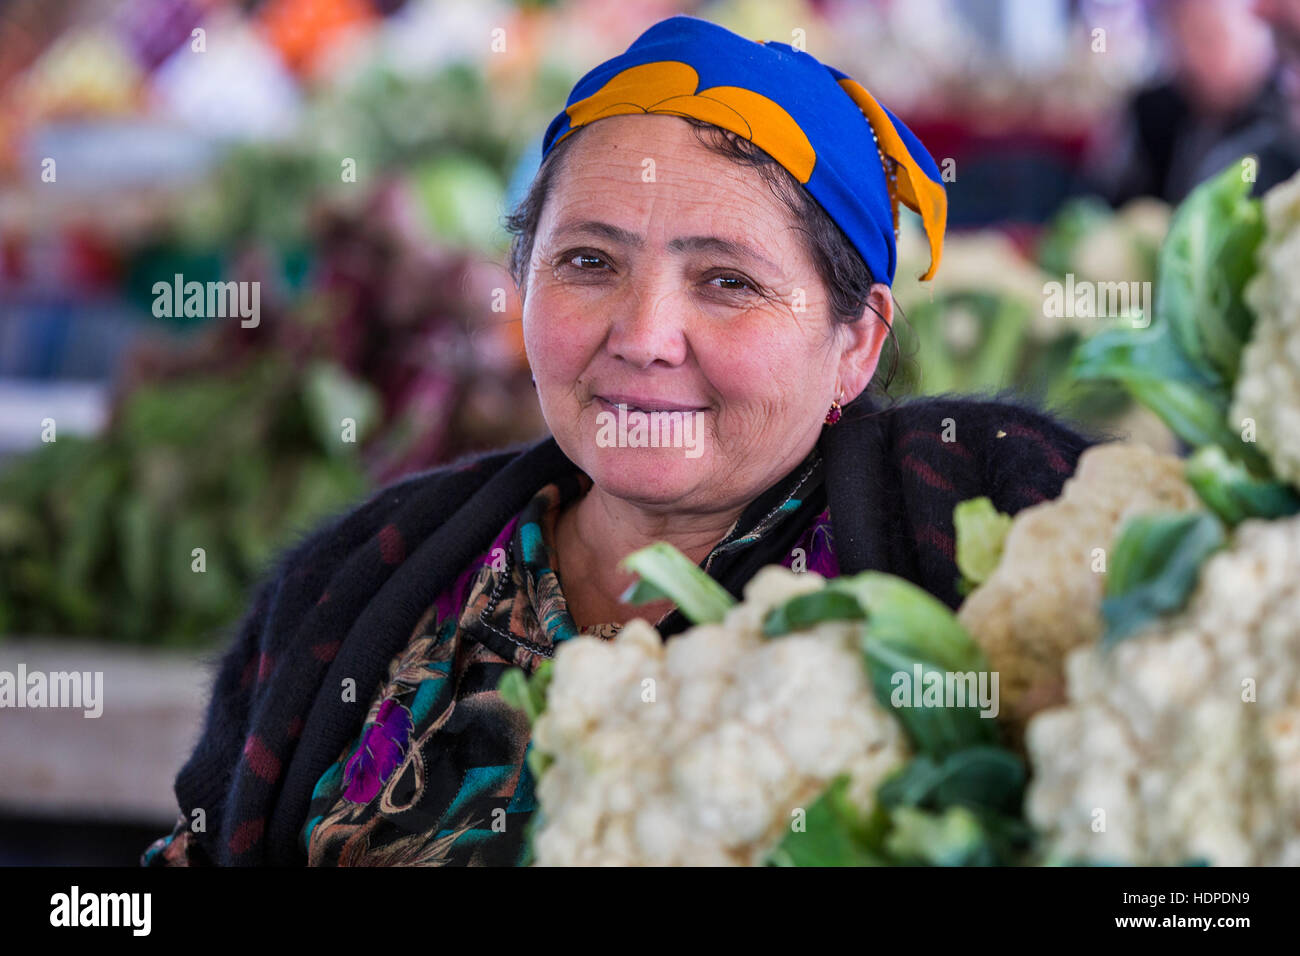 Rencontrer femmes roumaines image 1